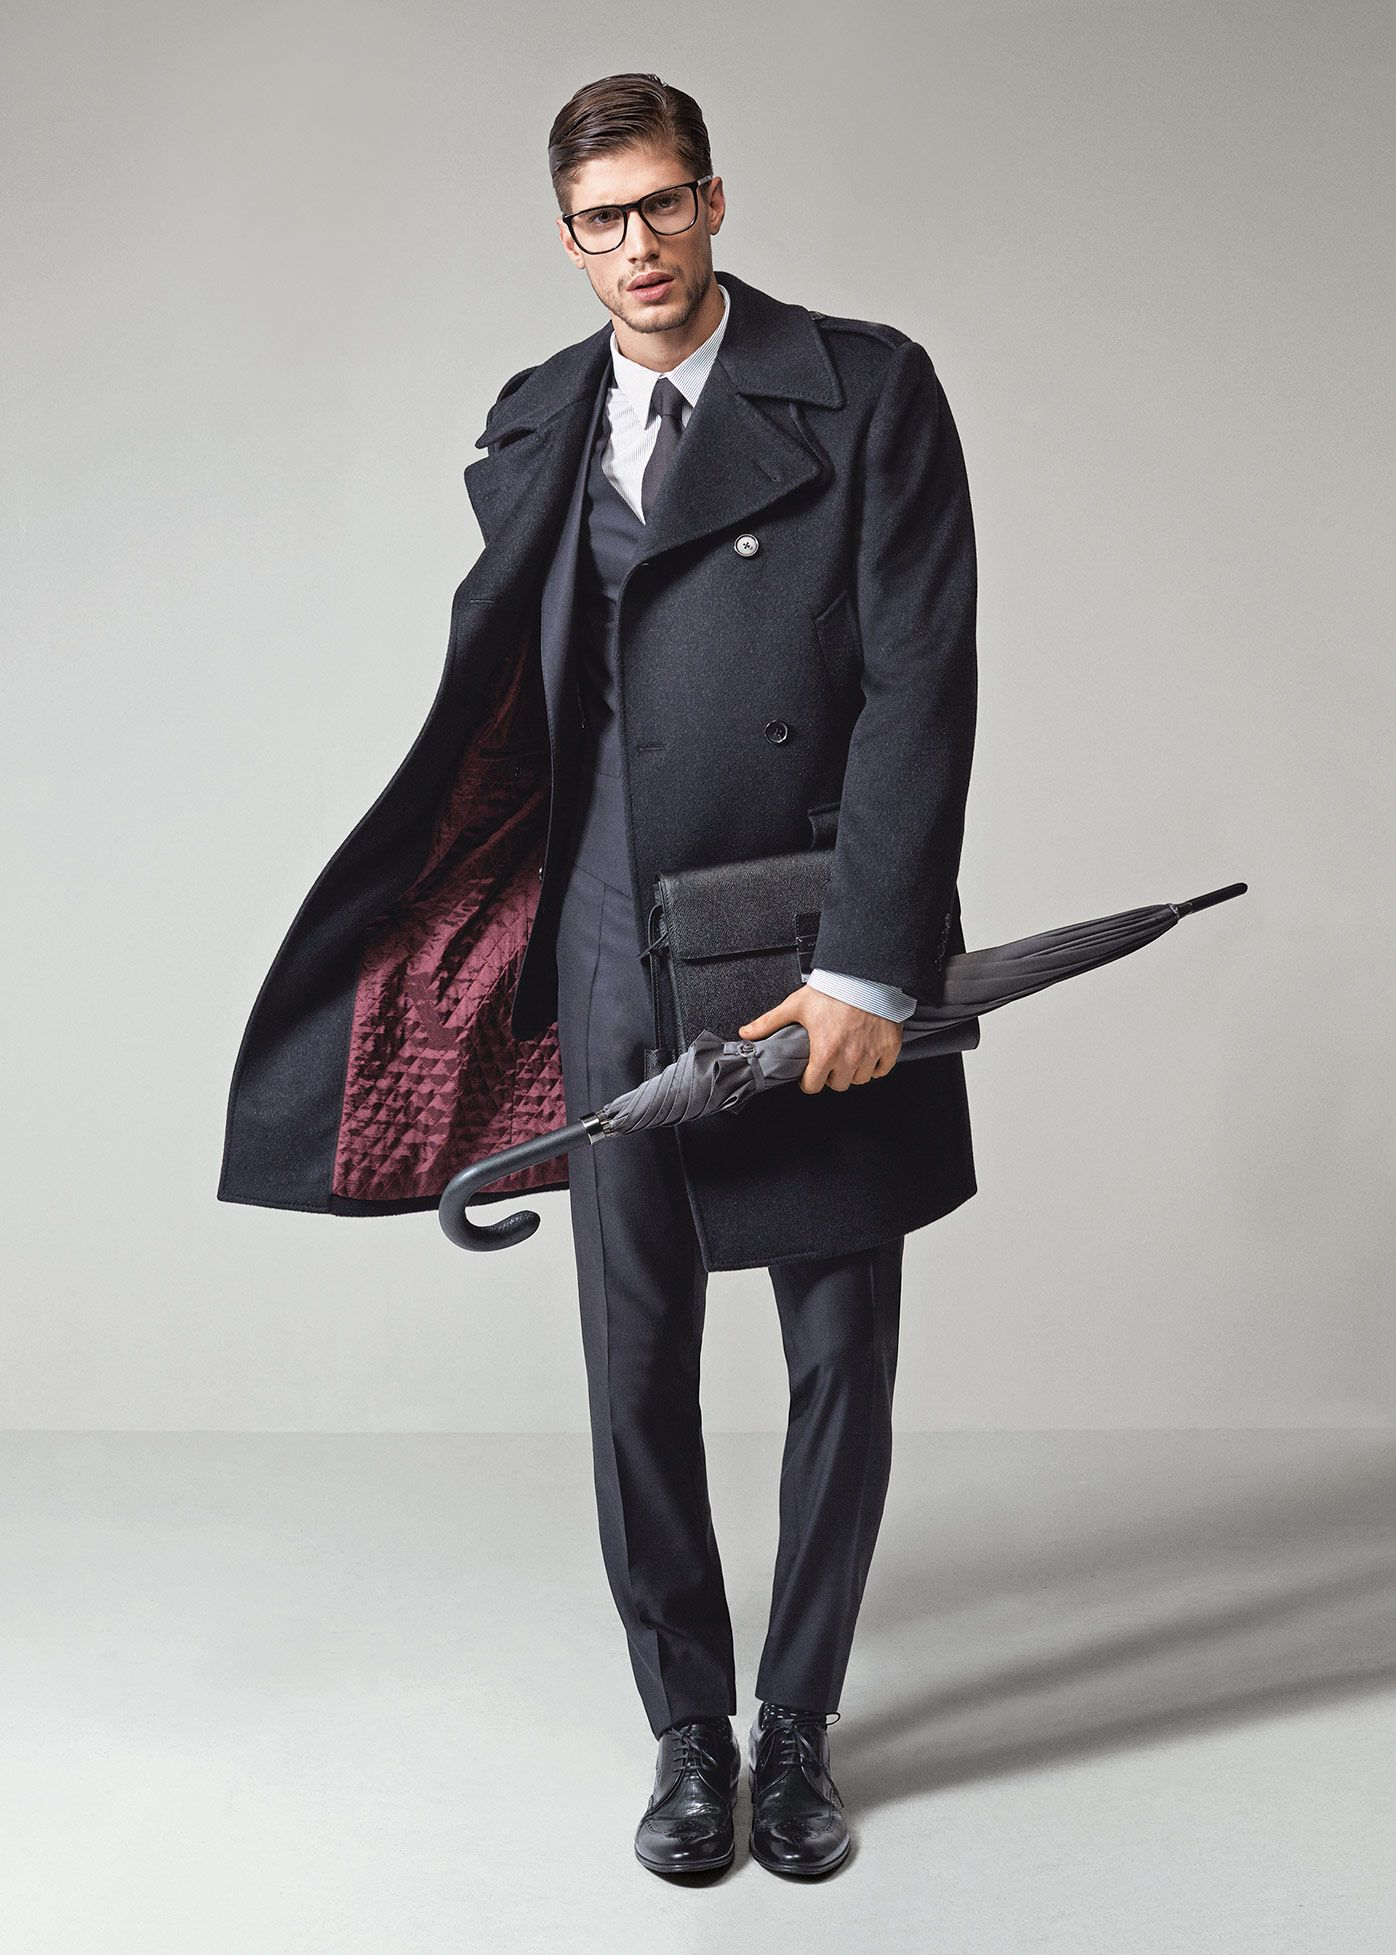 dolce gabbana inverno 2016 giacche uomo